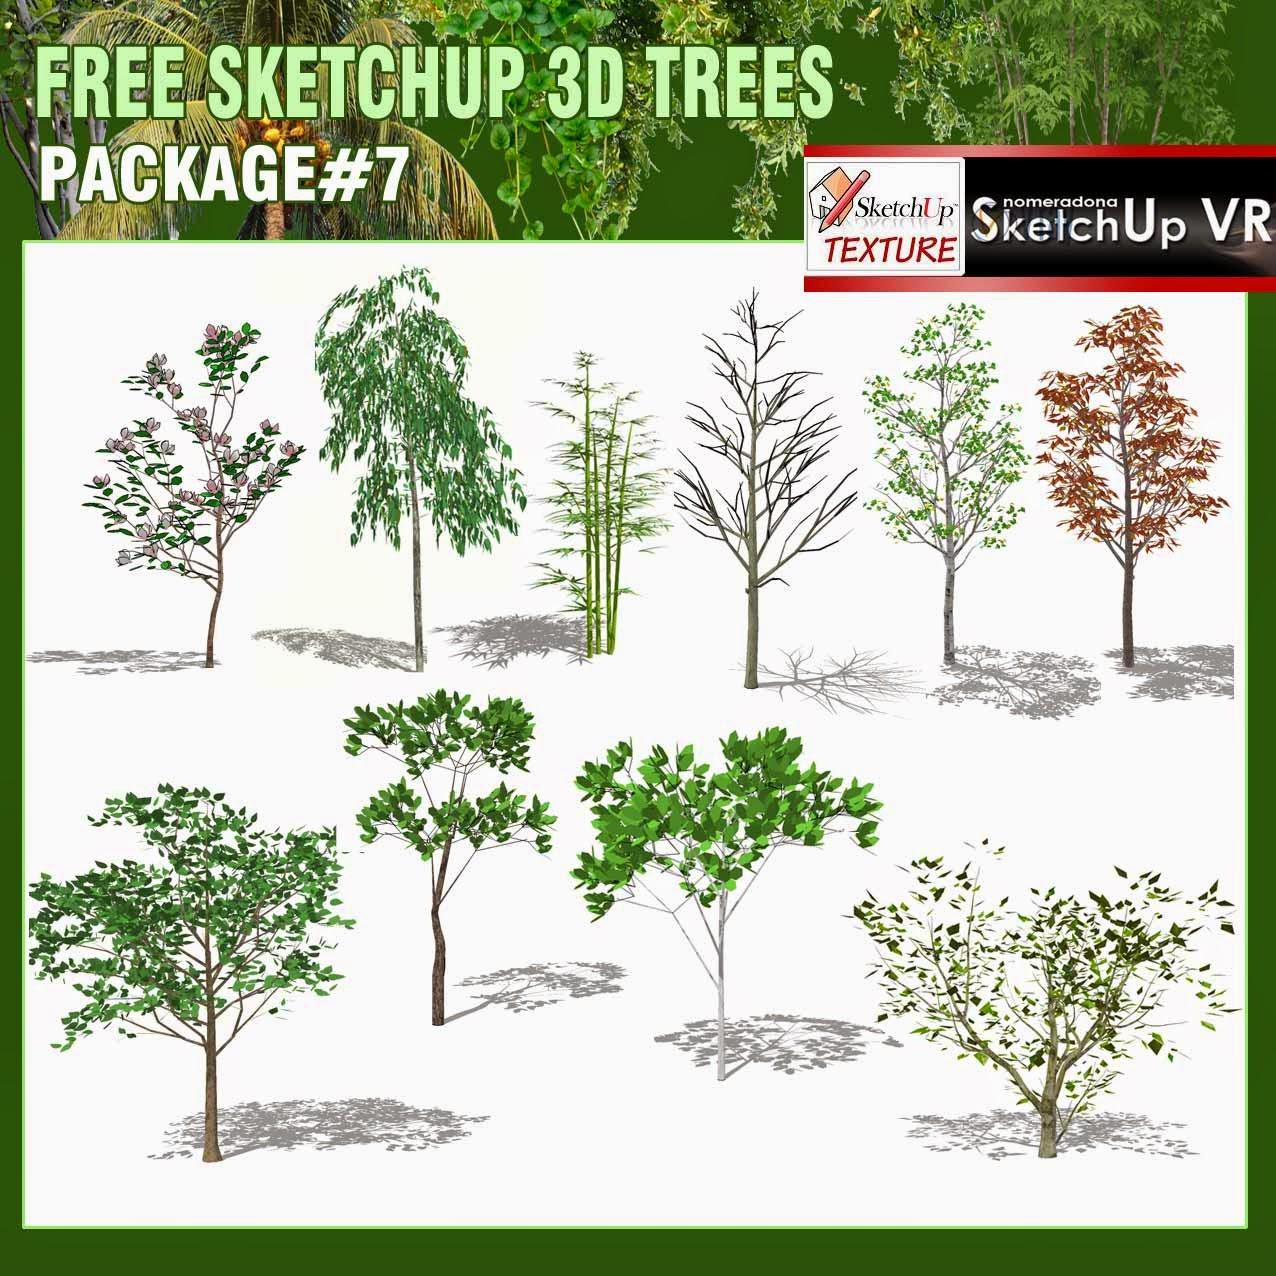 Free Sketchup 3d Trees Package 7